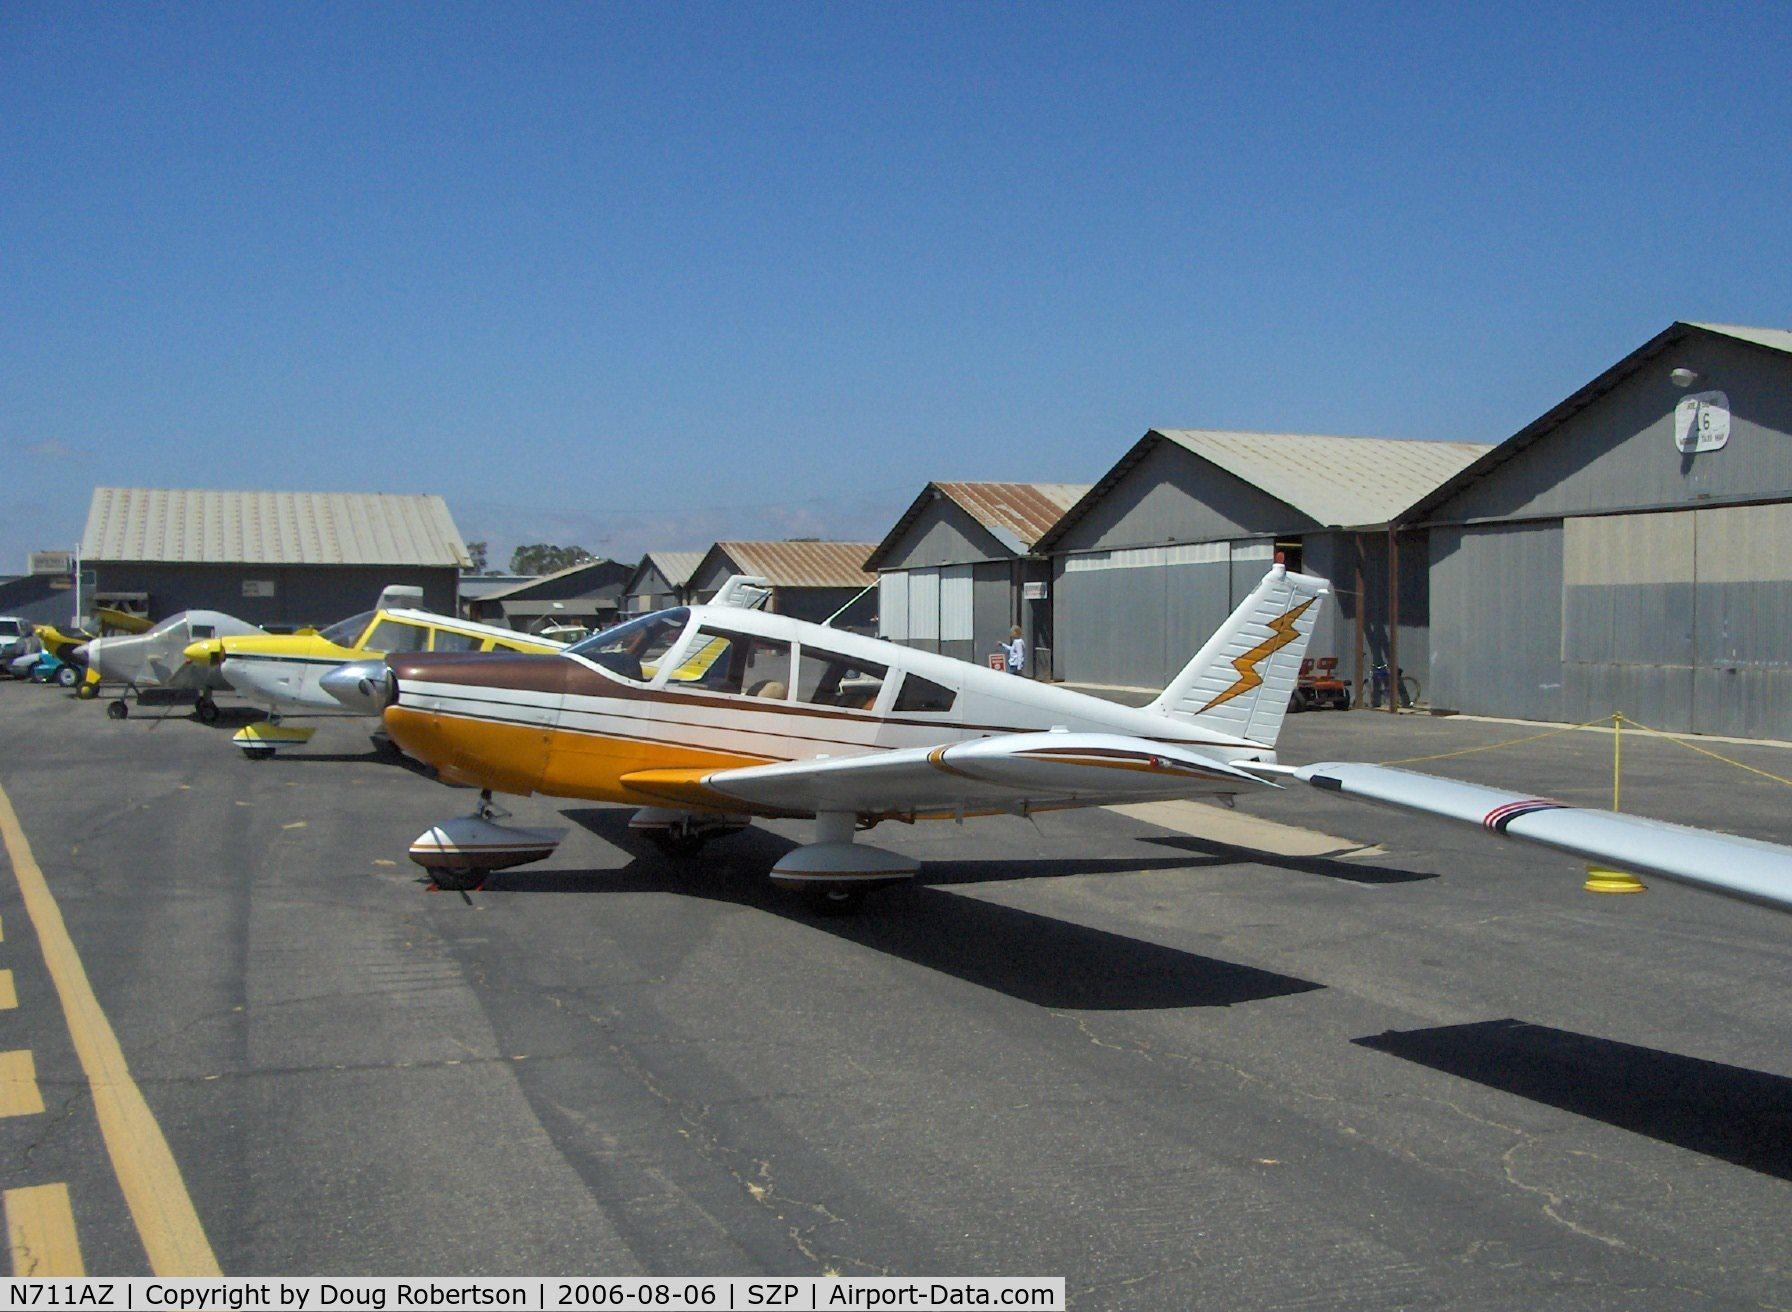 Aircraft N711AZ (1970 Piper PA-28-235 Cherokee C/N 28-11361